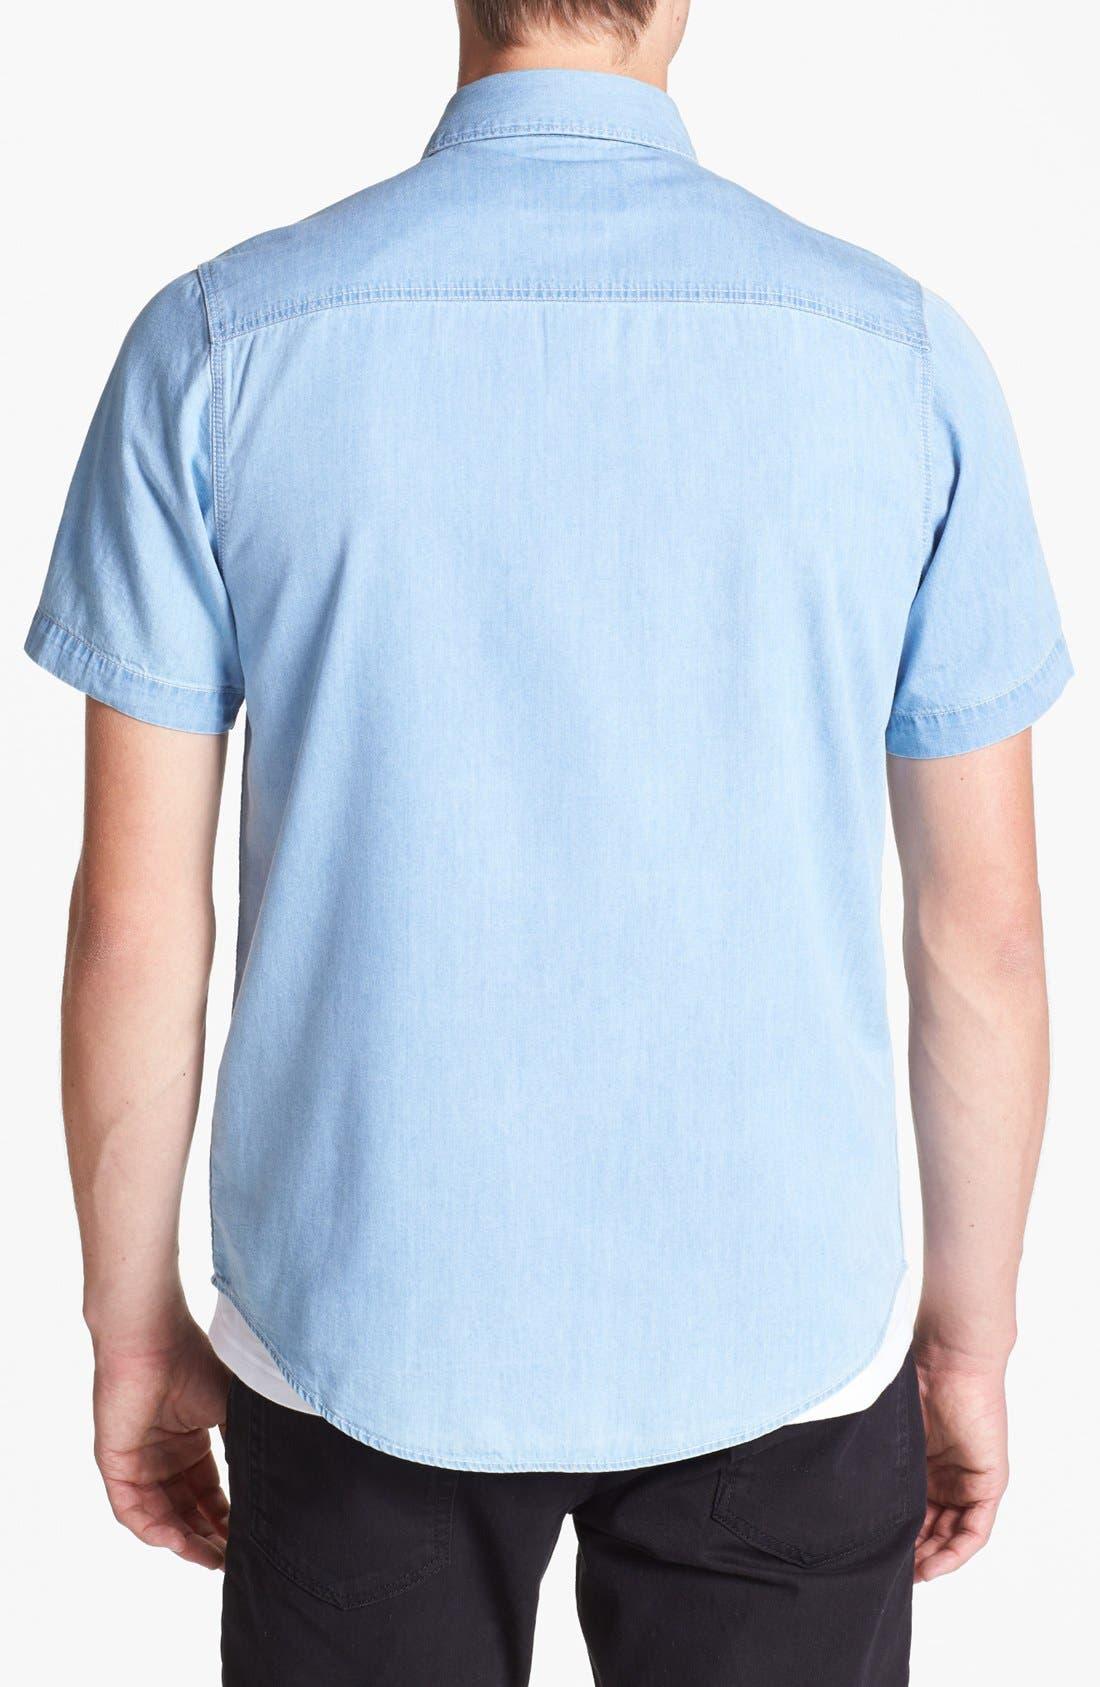 Alternate Image 2  - Topman Short Sleeve Denim Shirt